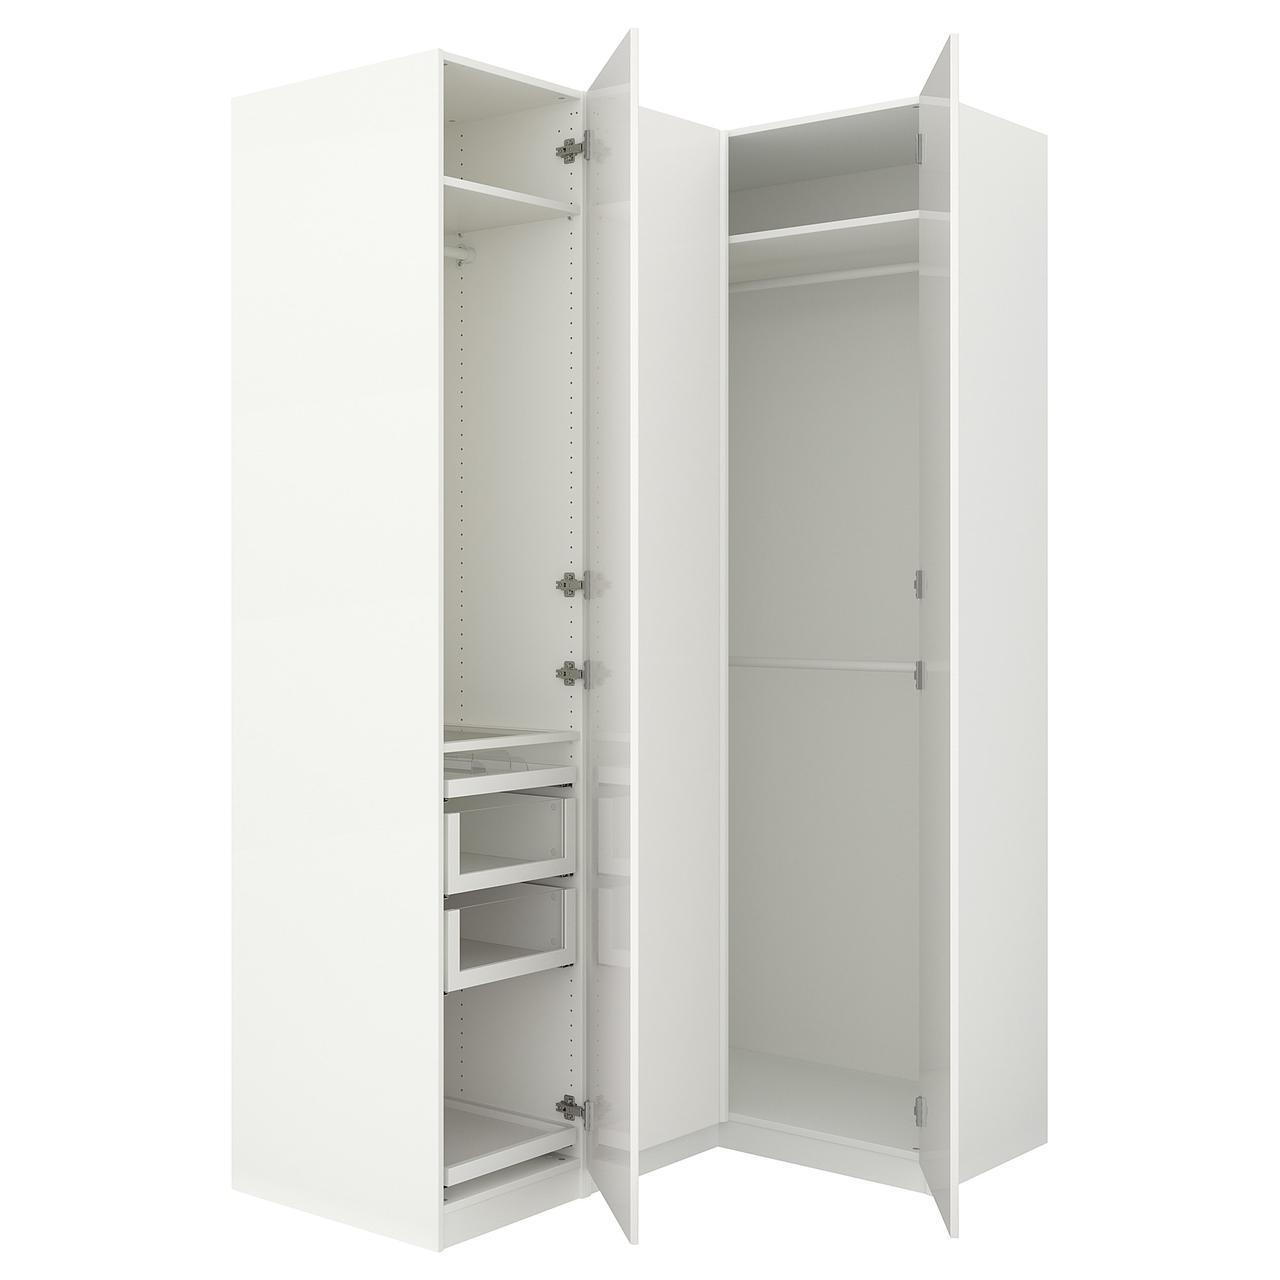 Угловой шкаф IKEA PAX 160/111x236 см Fardal белый глянец 792.179.64